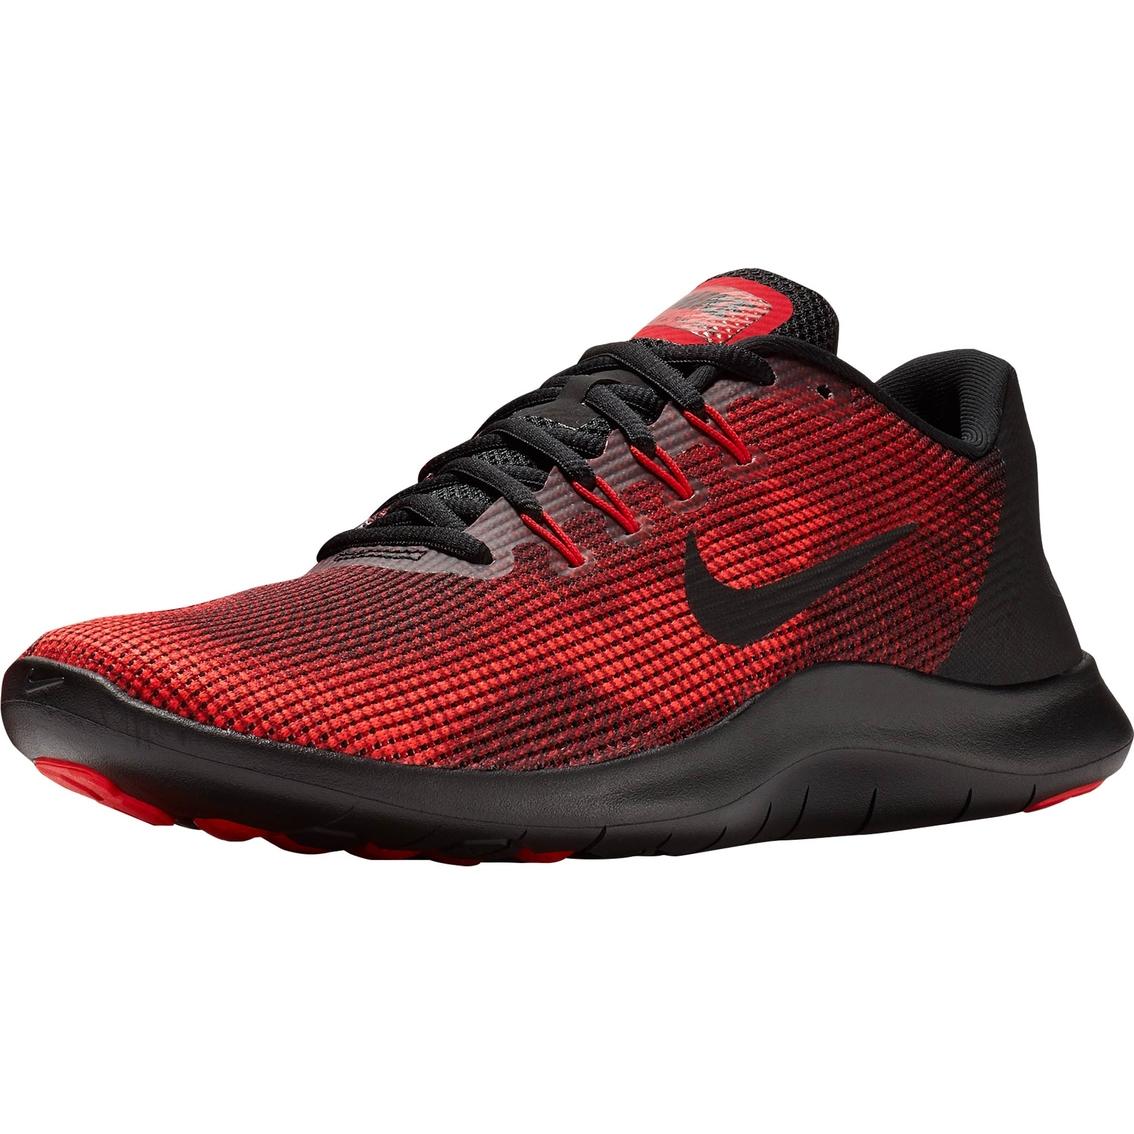 410fd70247fe1 Nike Men's Flex Rn 2018 Running Shoes | Running | Shoes | Shop The ...